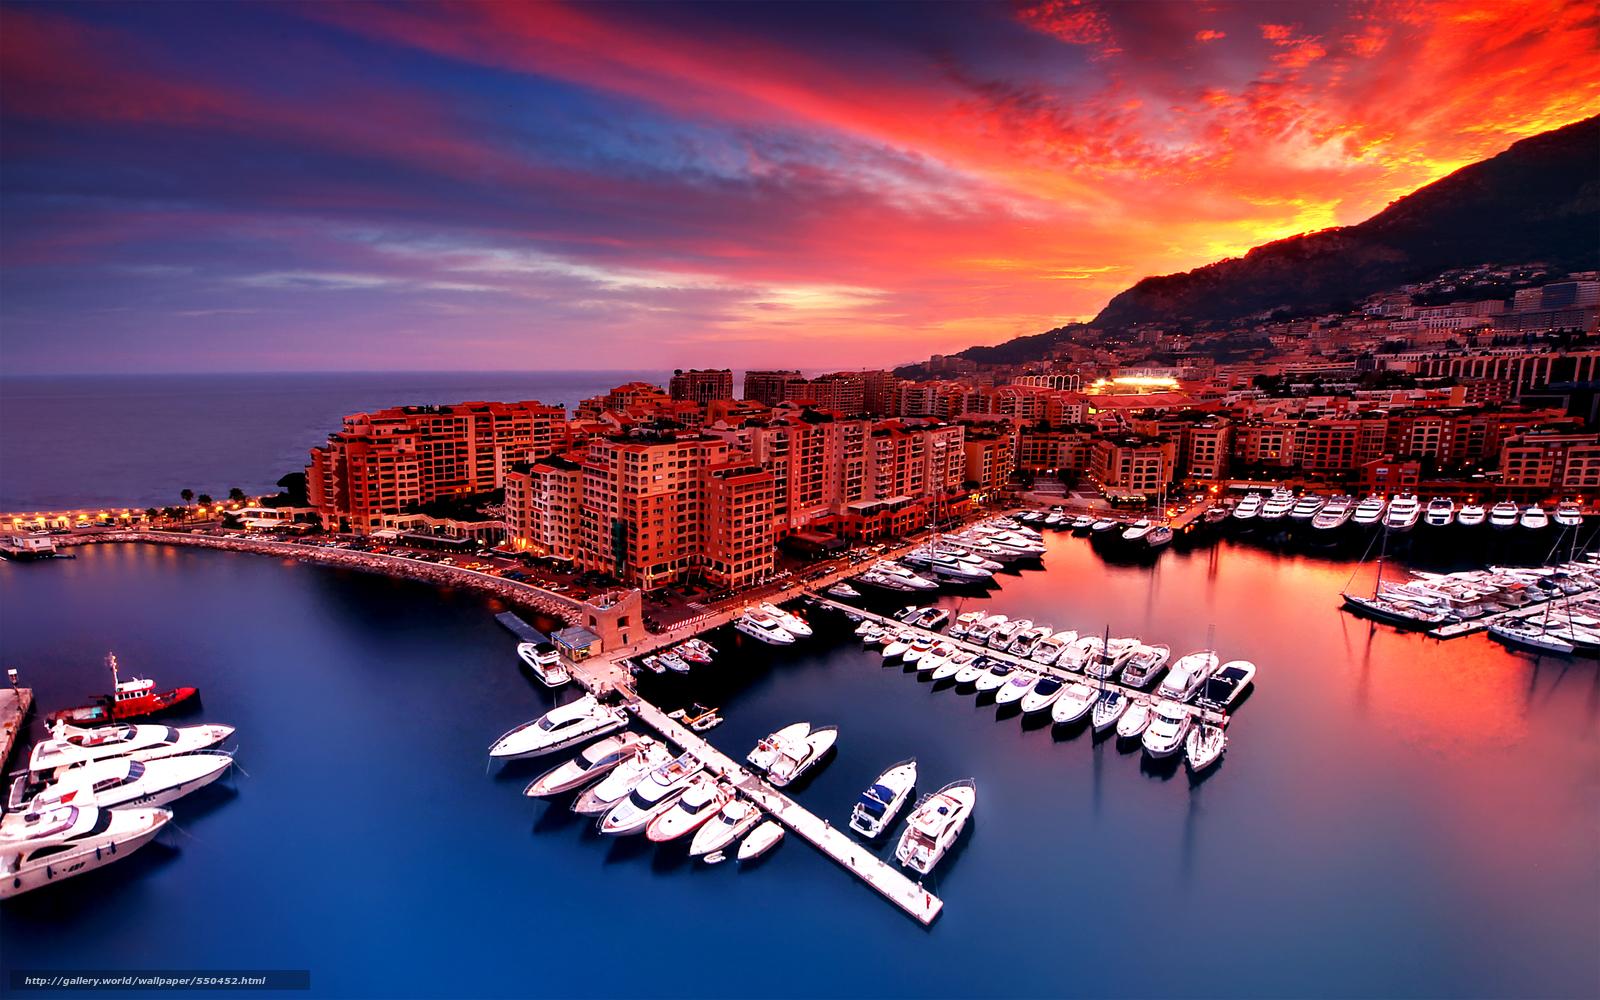 Tlcharger Fond d'ecran Fontvieille, Monaco, ville Fonds d'ecran ...